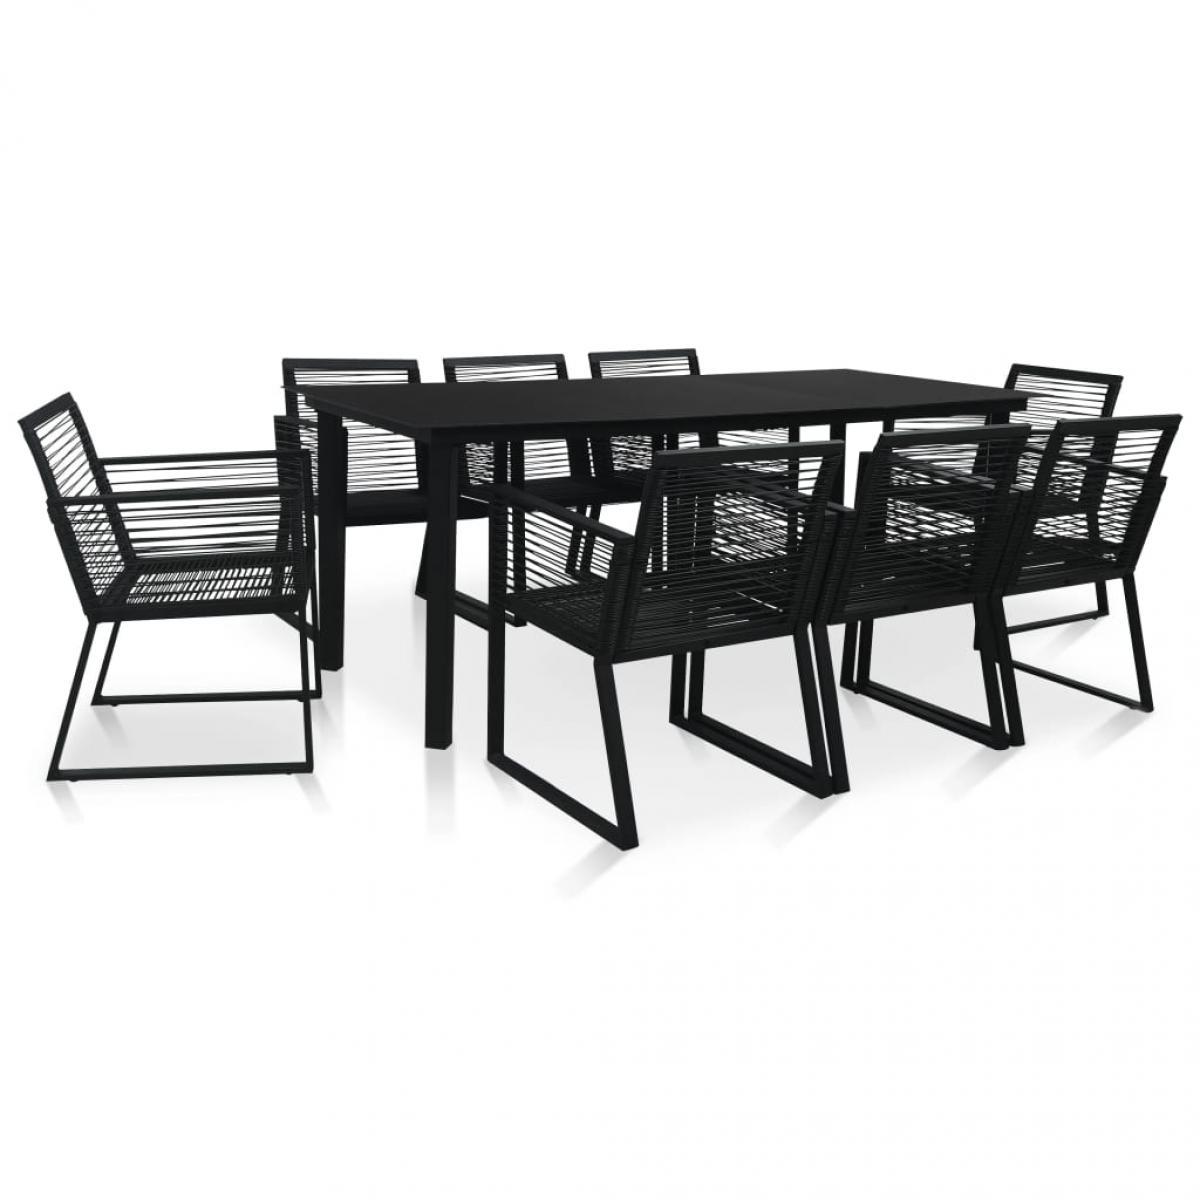 Vidaxl vidaXL Mobilier à dîner d'extérieur 9 pcs Rotin PVC Noir